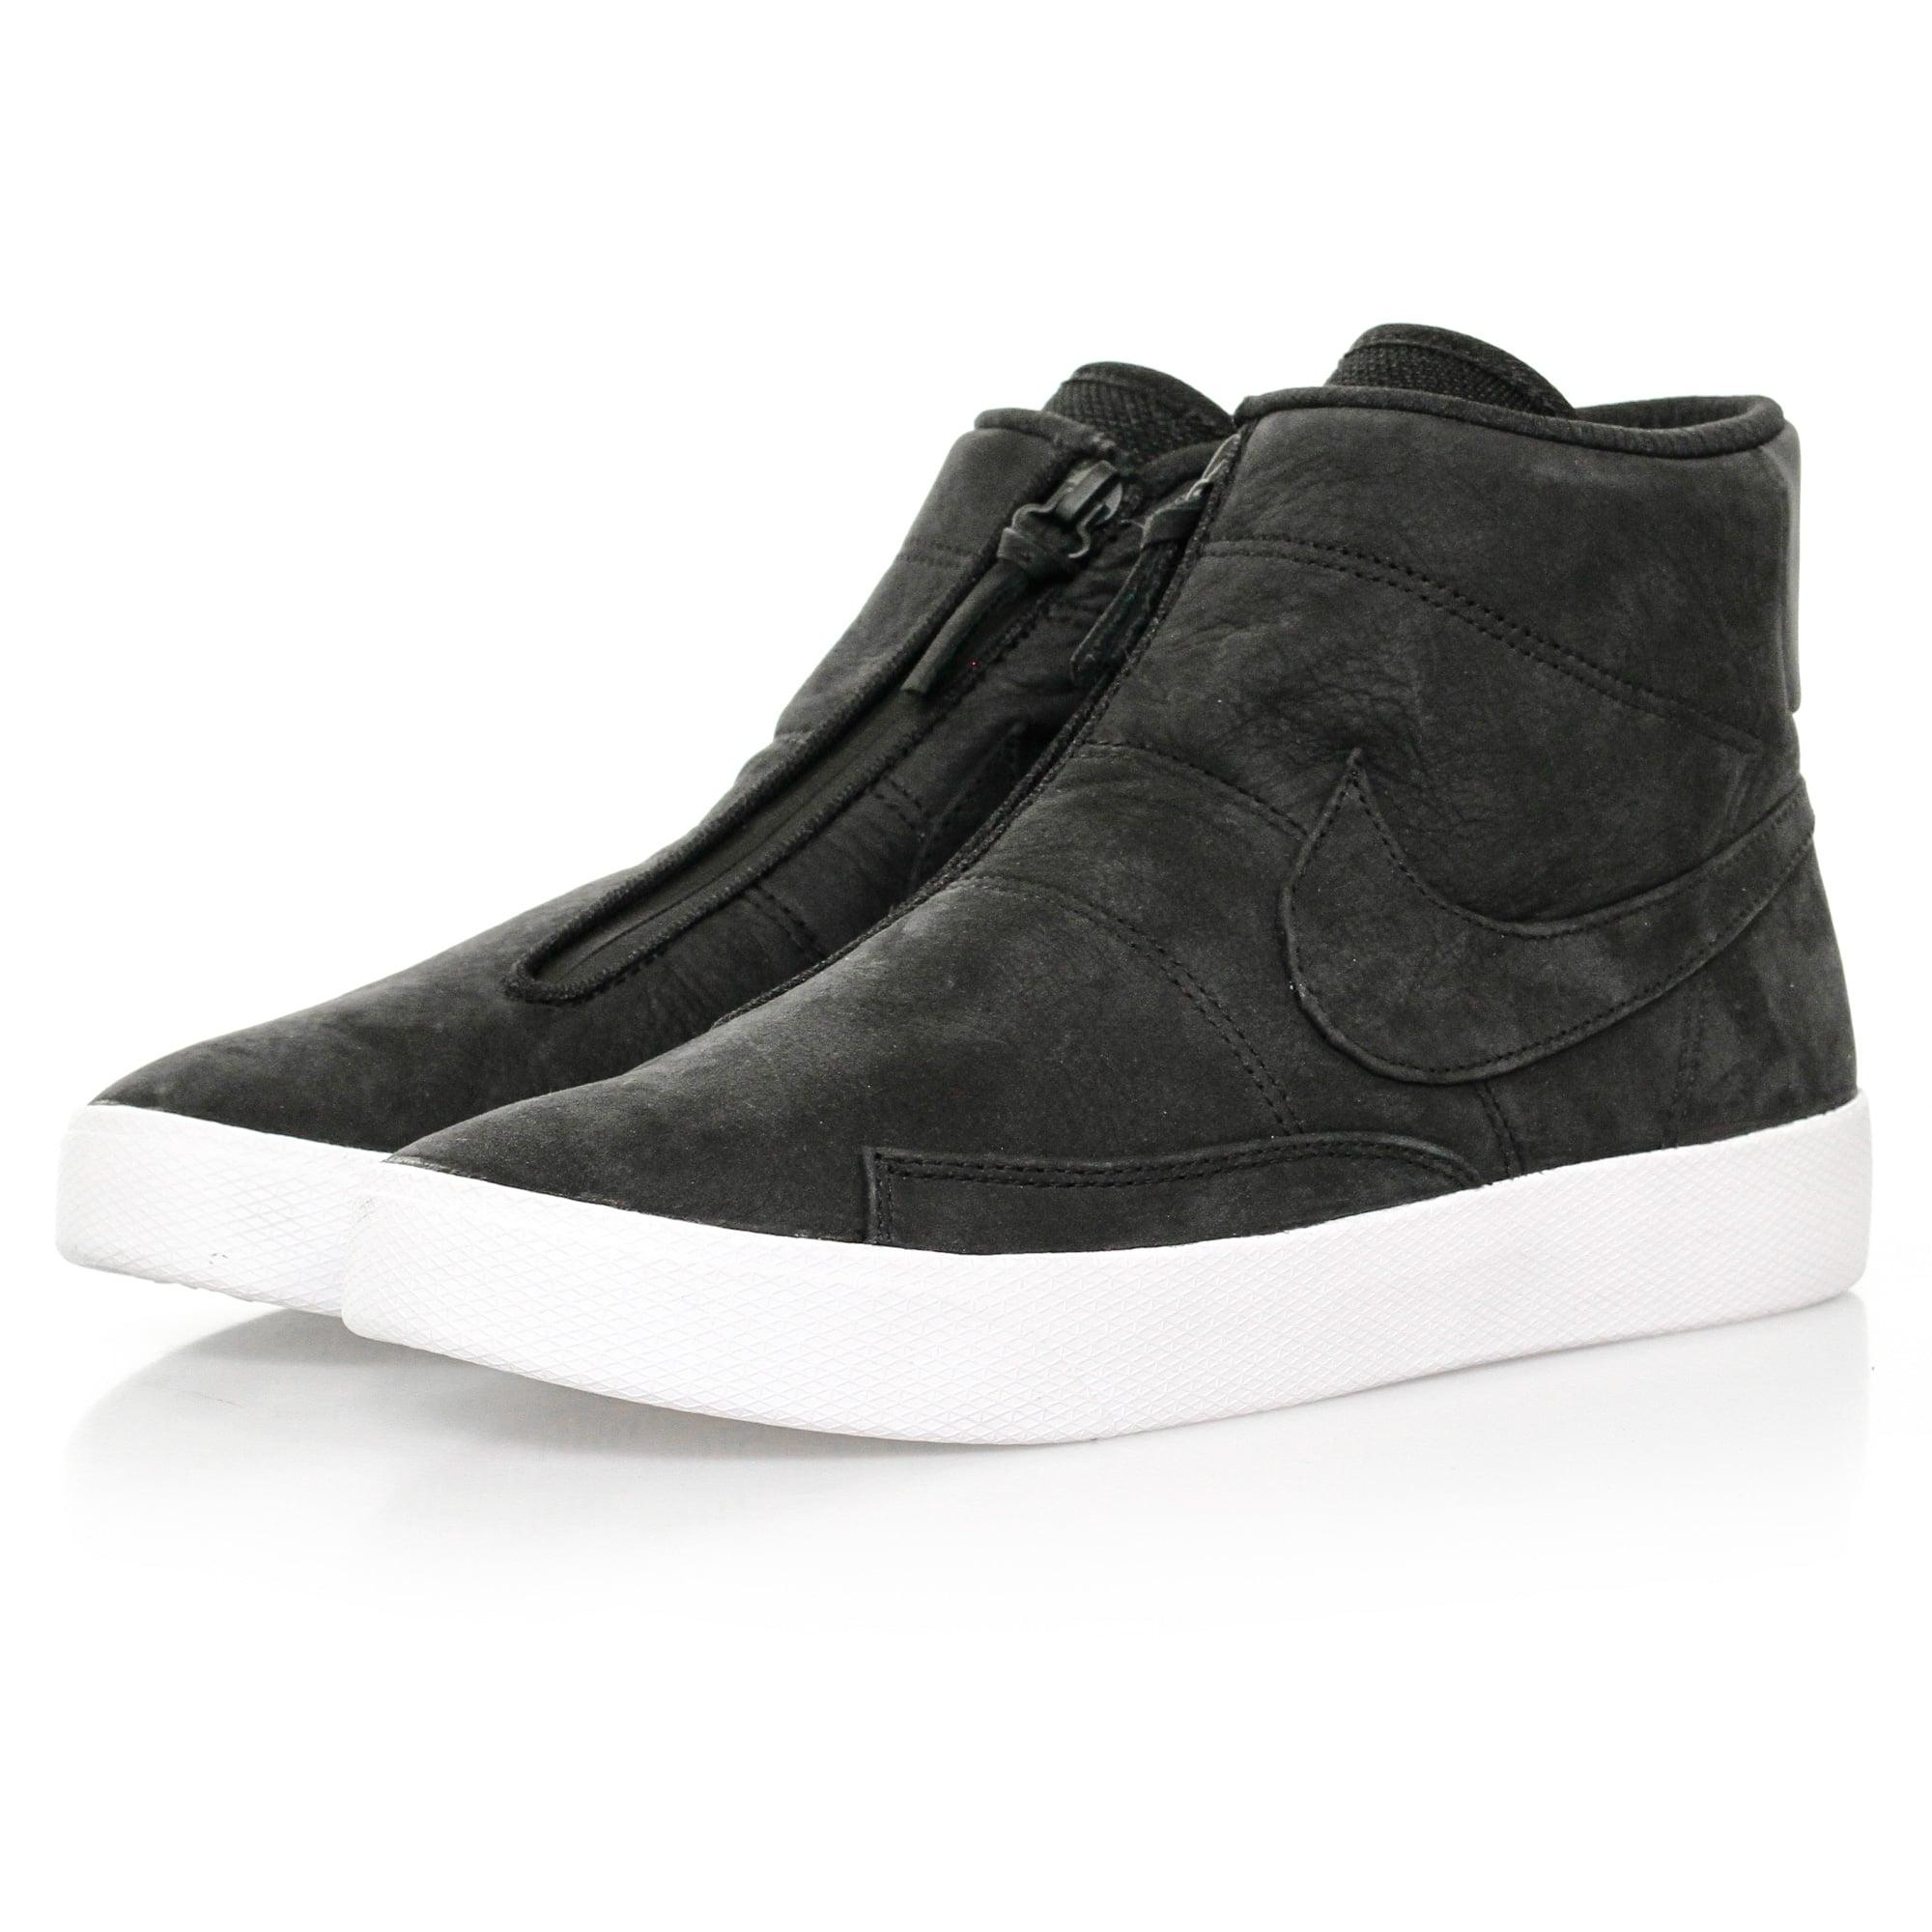 ... release date nike blazer advanced black shoe 859200 001 lyst c396e e4a27 dc6e9cd847